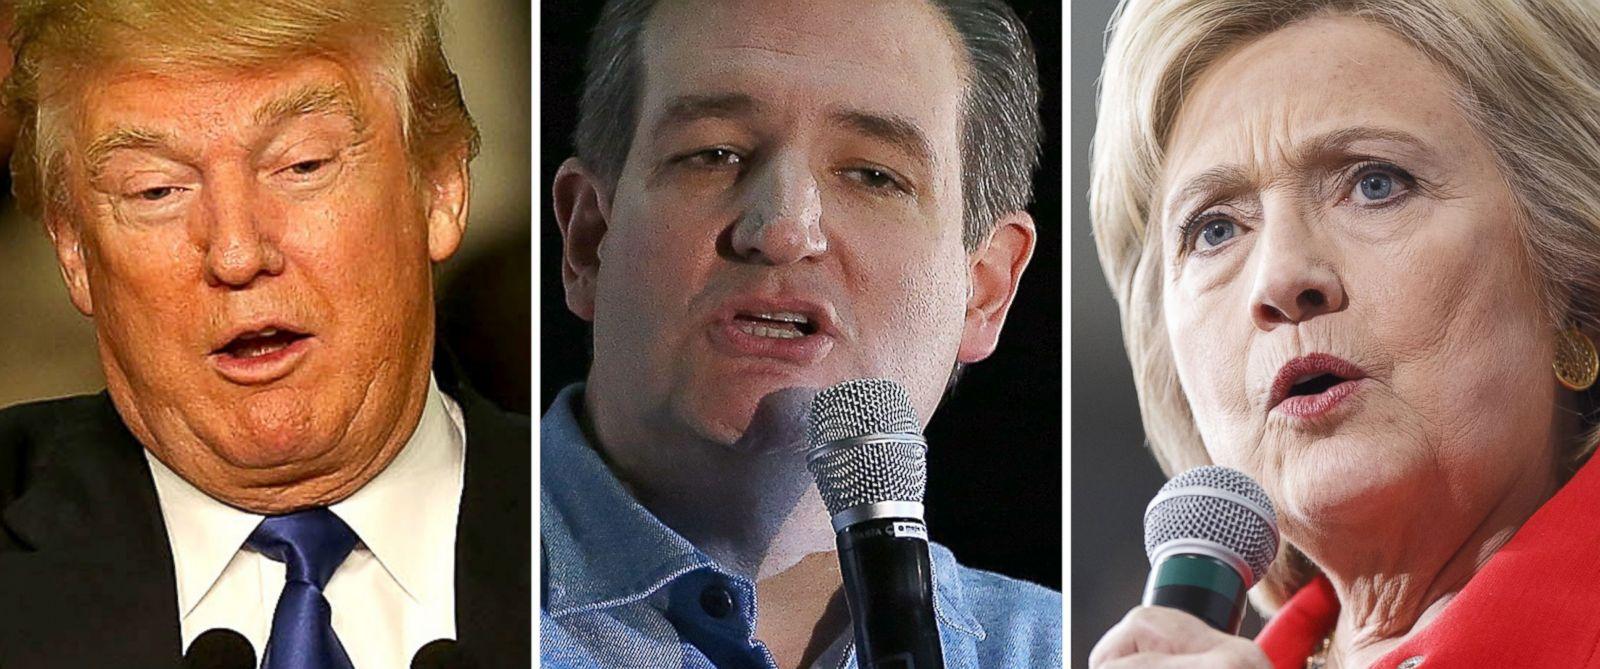 PHOTO: Donald Trump speaks in Clinton, Iowa on Jan. 30, 2016, Ted Cruz speaks in Des Moines, Iowa, Jan. 31, 2016 and Hillary Clinton speaks in Ames, Iowa, Jan. 30, 2016.